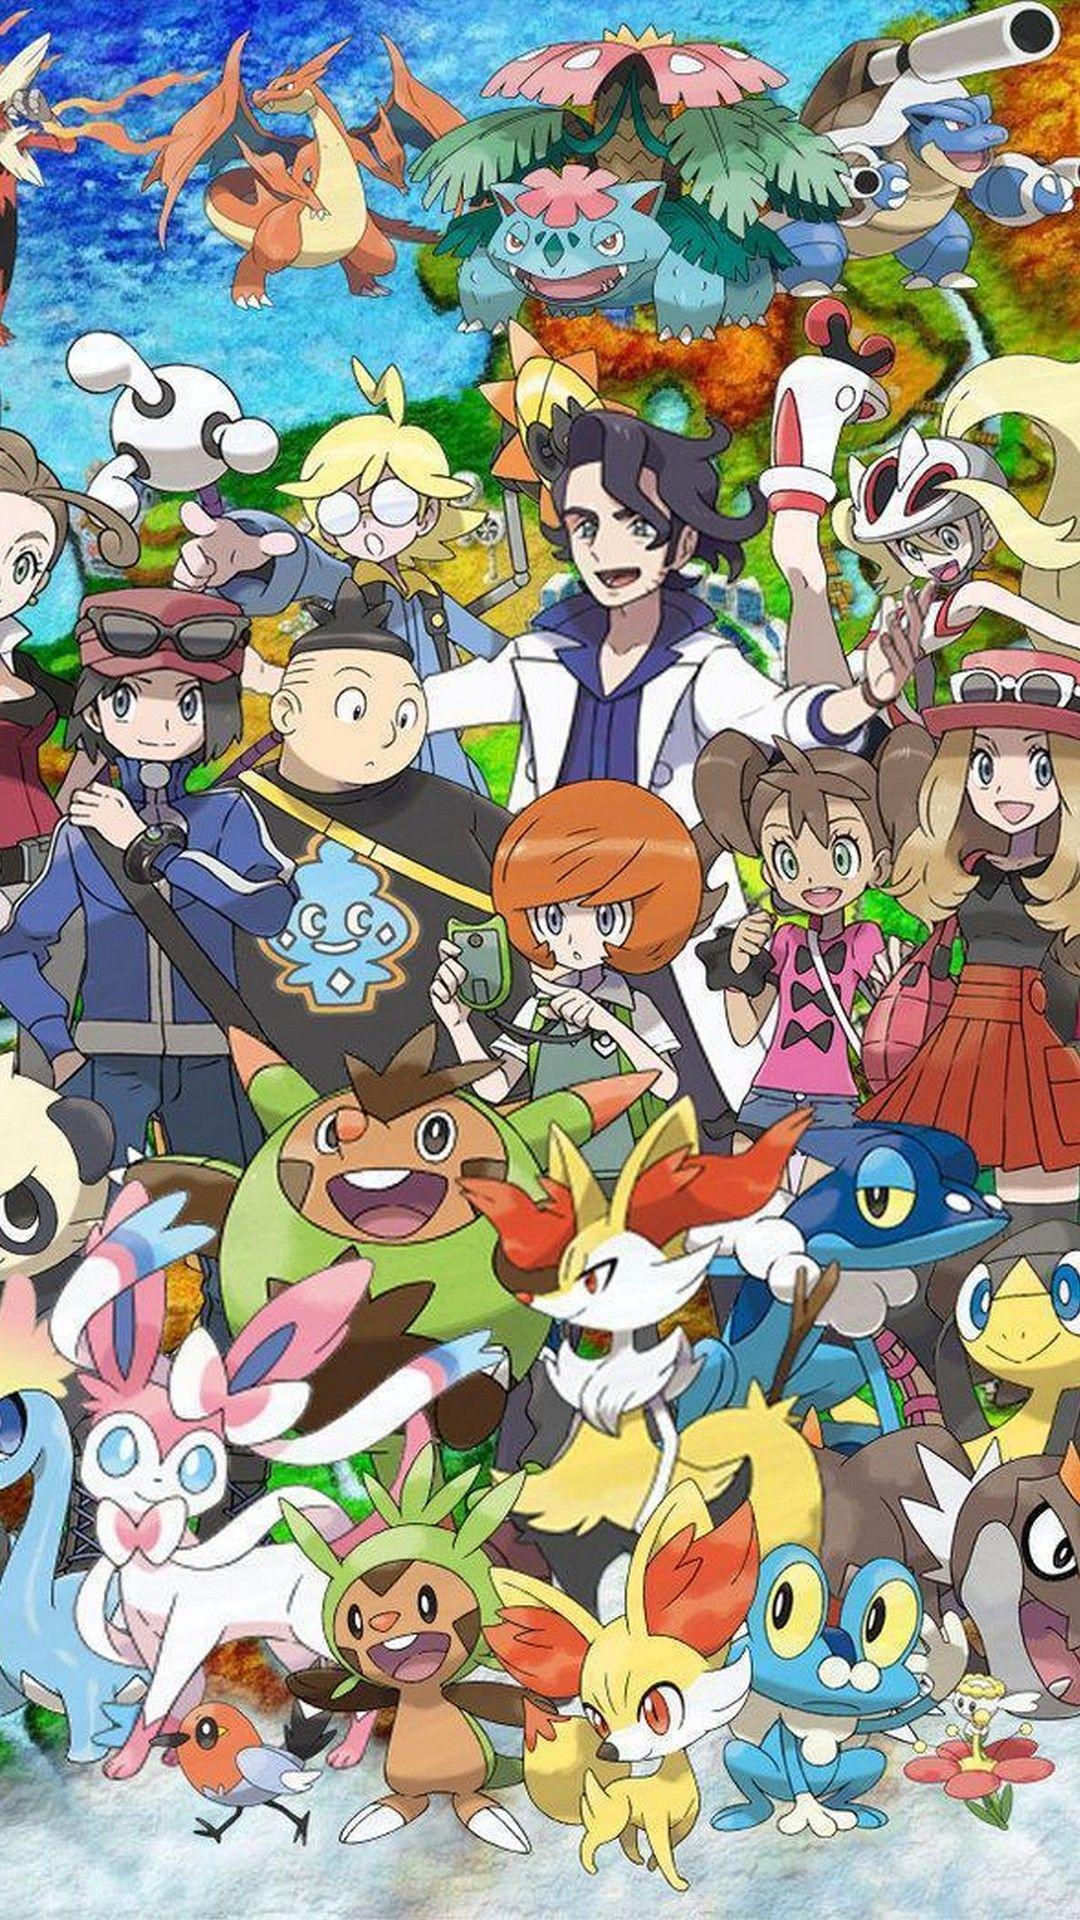 Phones Wallpaper Pokemon Best Phone Wallpaper Iphone Wallpaper Pokemon Cute Pokemon Wallpaper Hd Pokemon Wallpapers